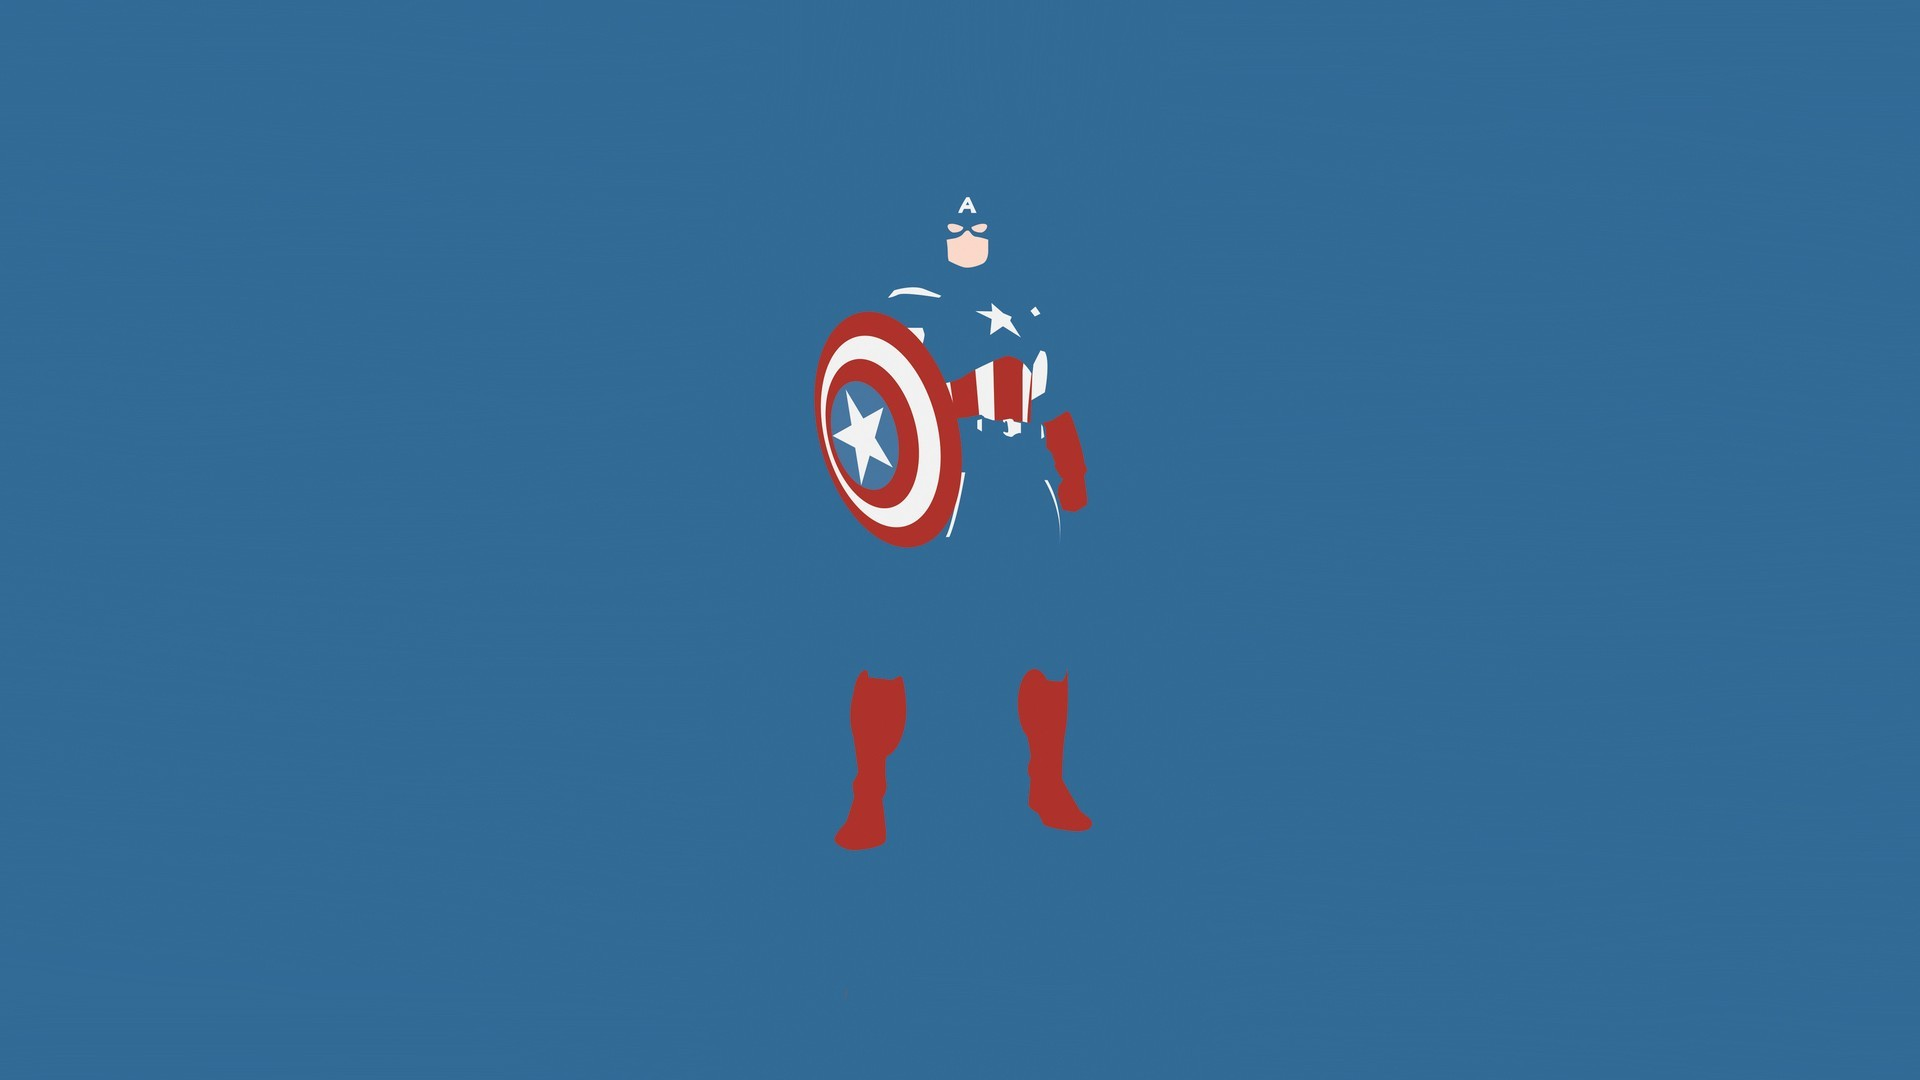 Sci Fi Iphone Wallpaper Captain America Minimalist Wallpaper 75 Images